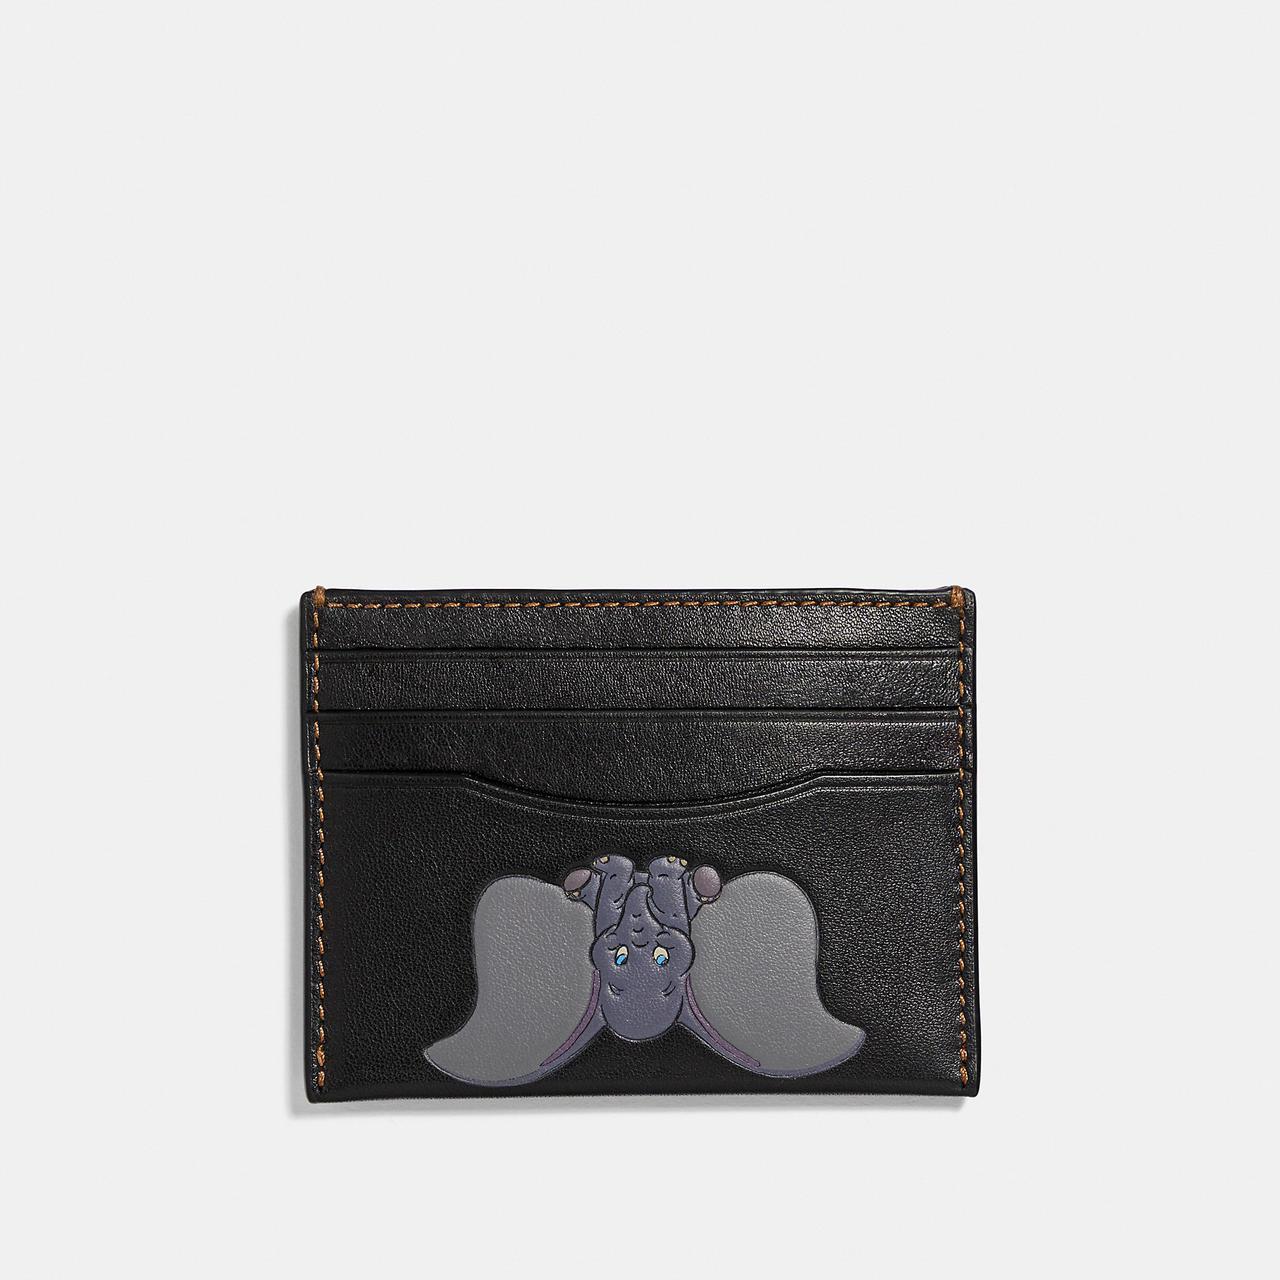 Dumbo印花卡夾,售價4,900元。圖/COACH提供